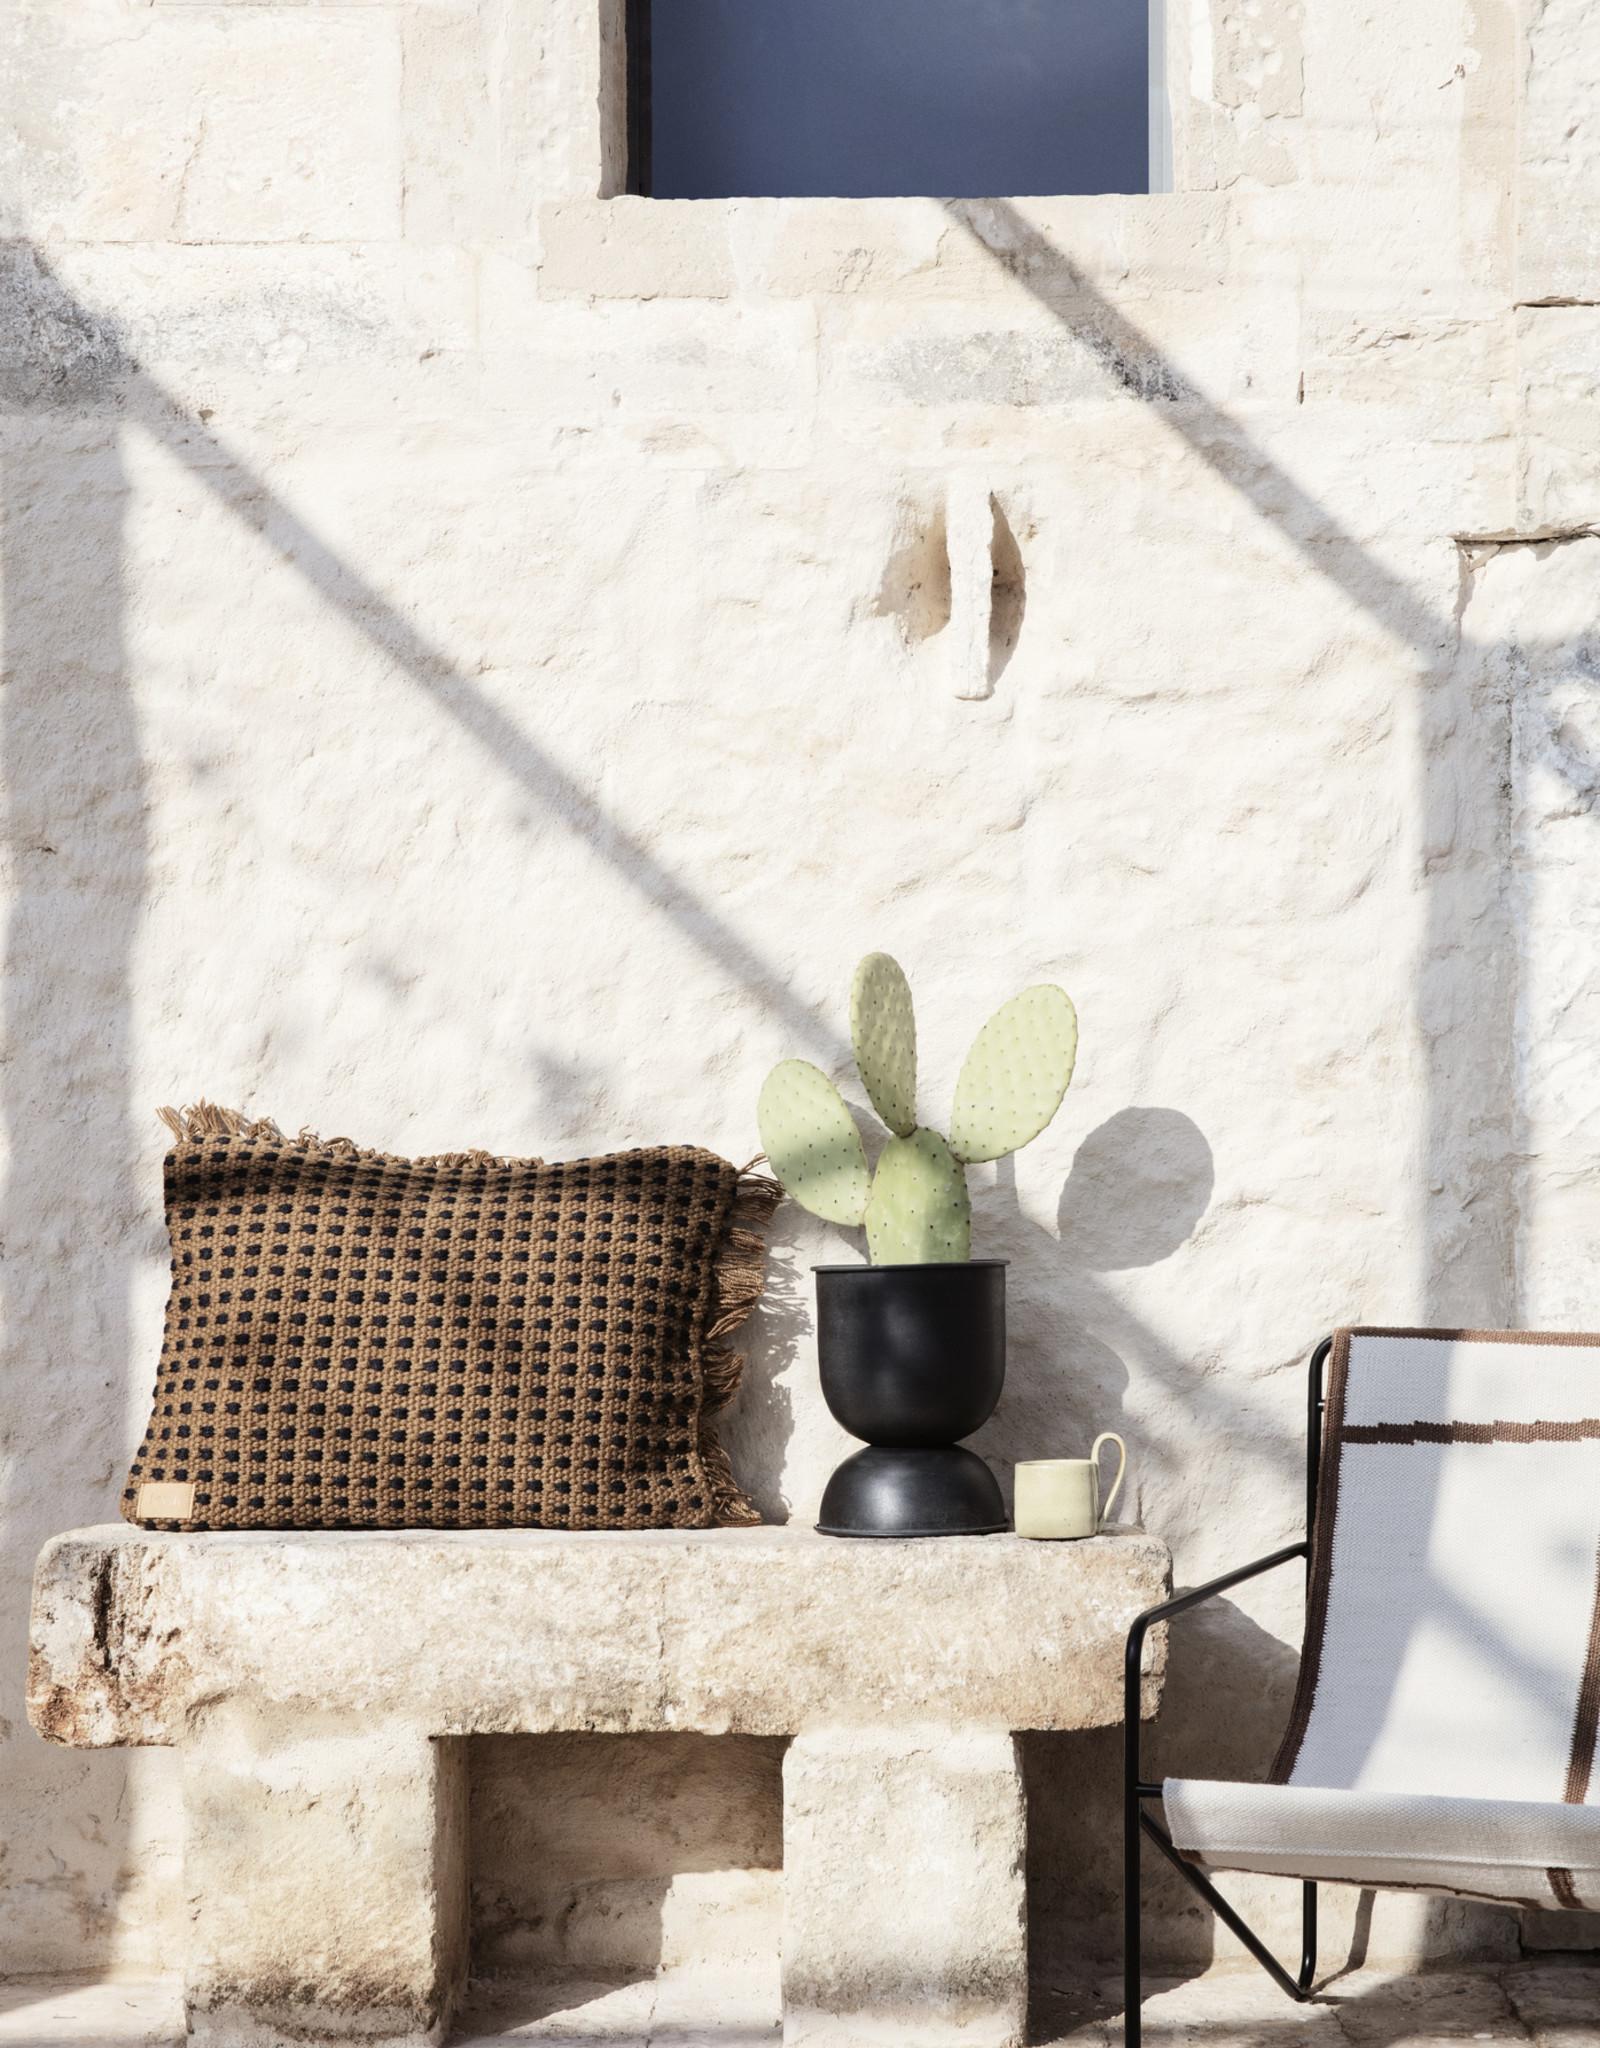 Ferm LIVING ferm LIVING Way Cushion Off-white/Blue